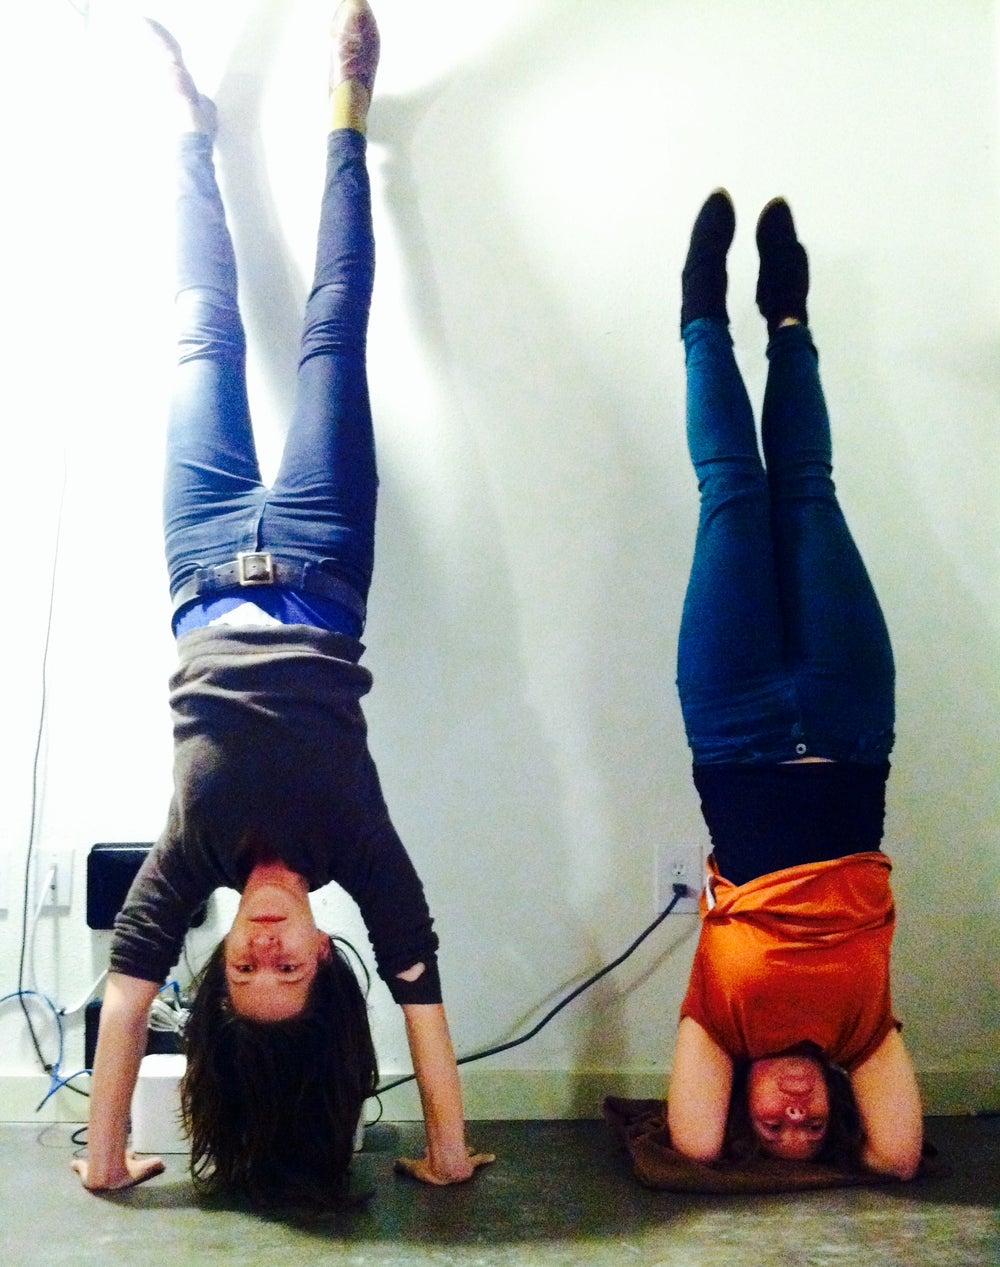 Do handstands when you're stuck.